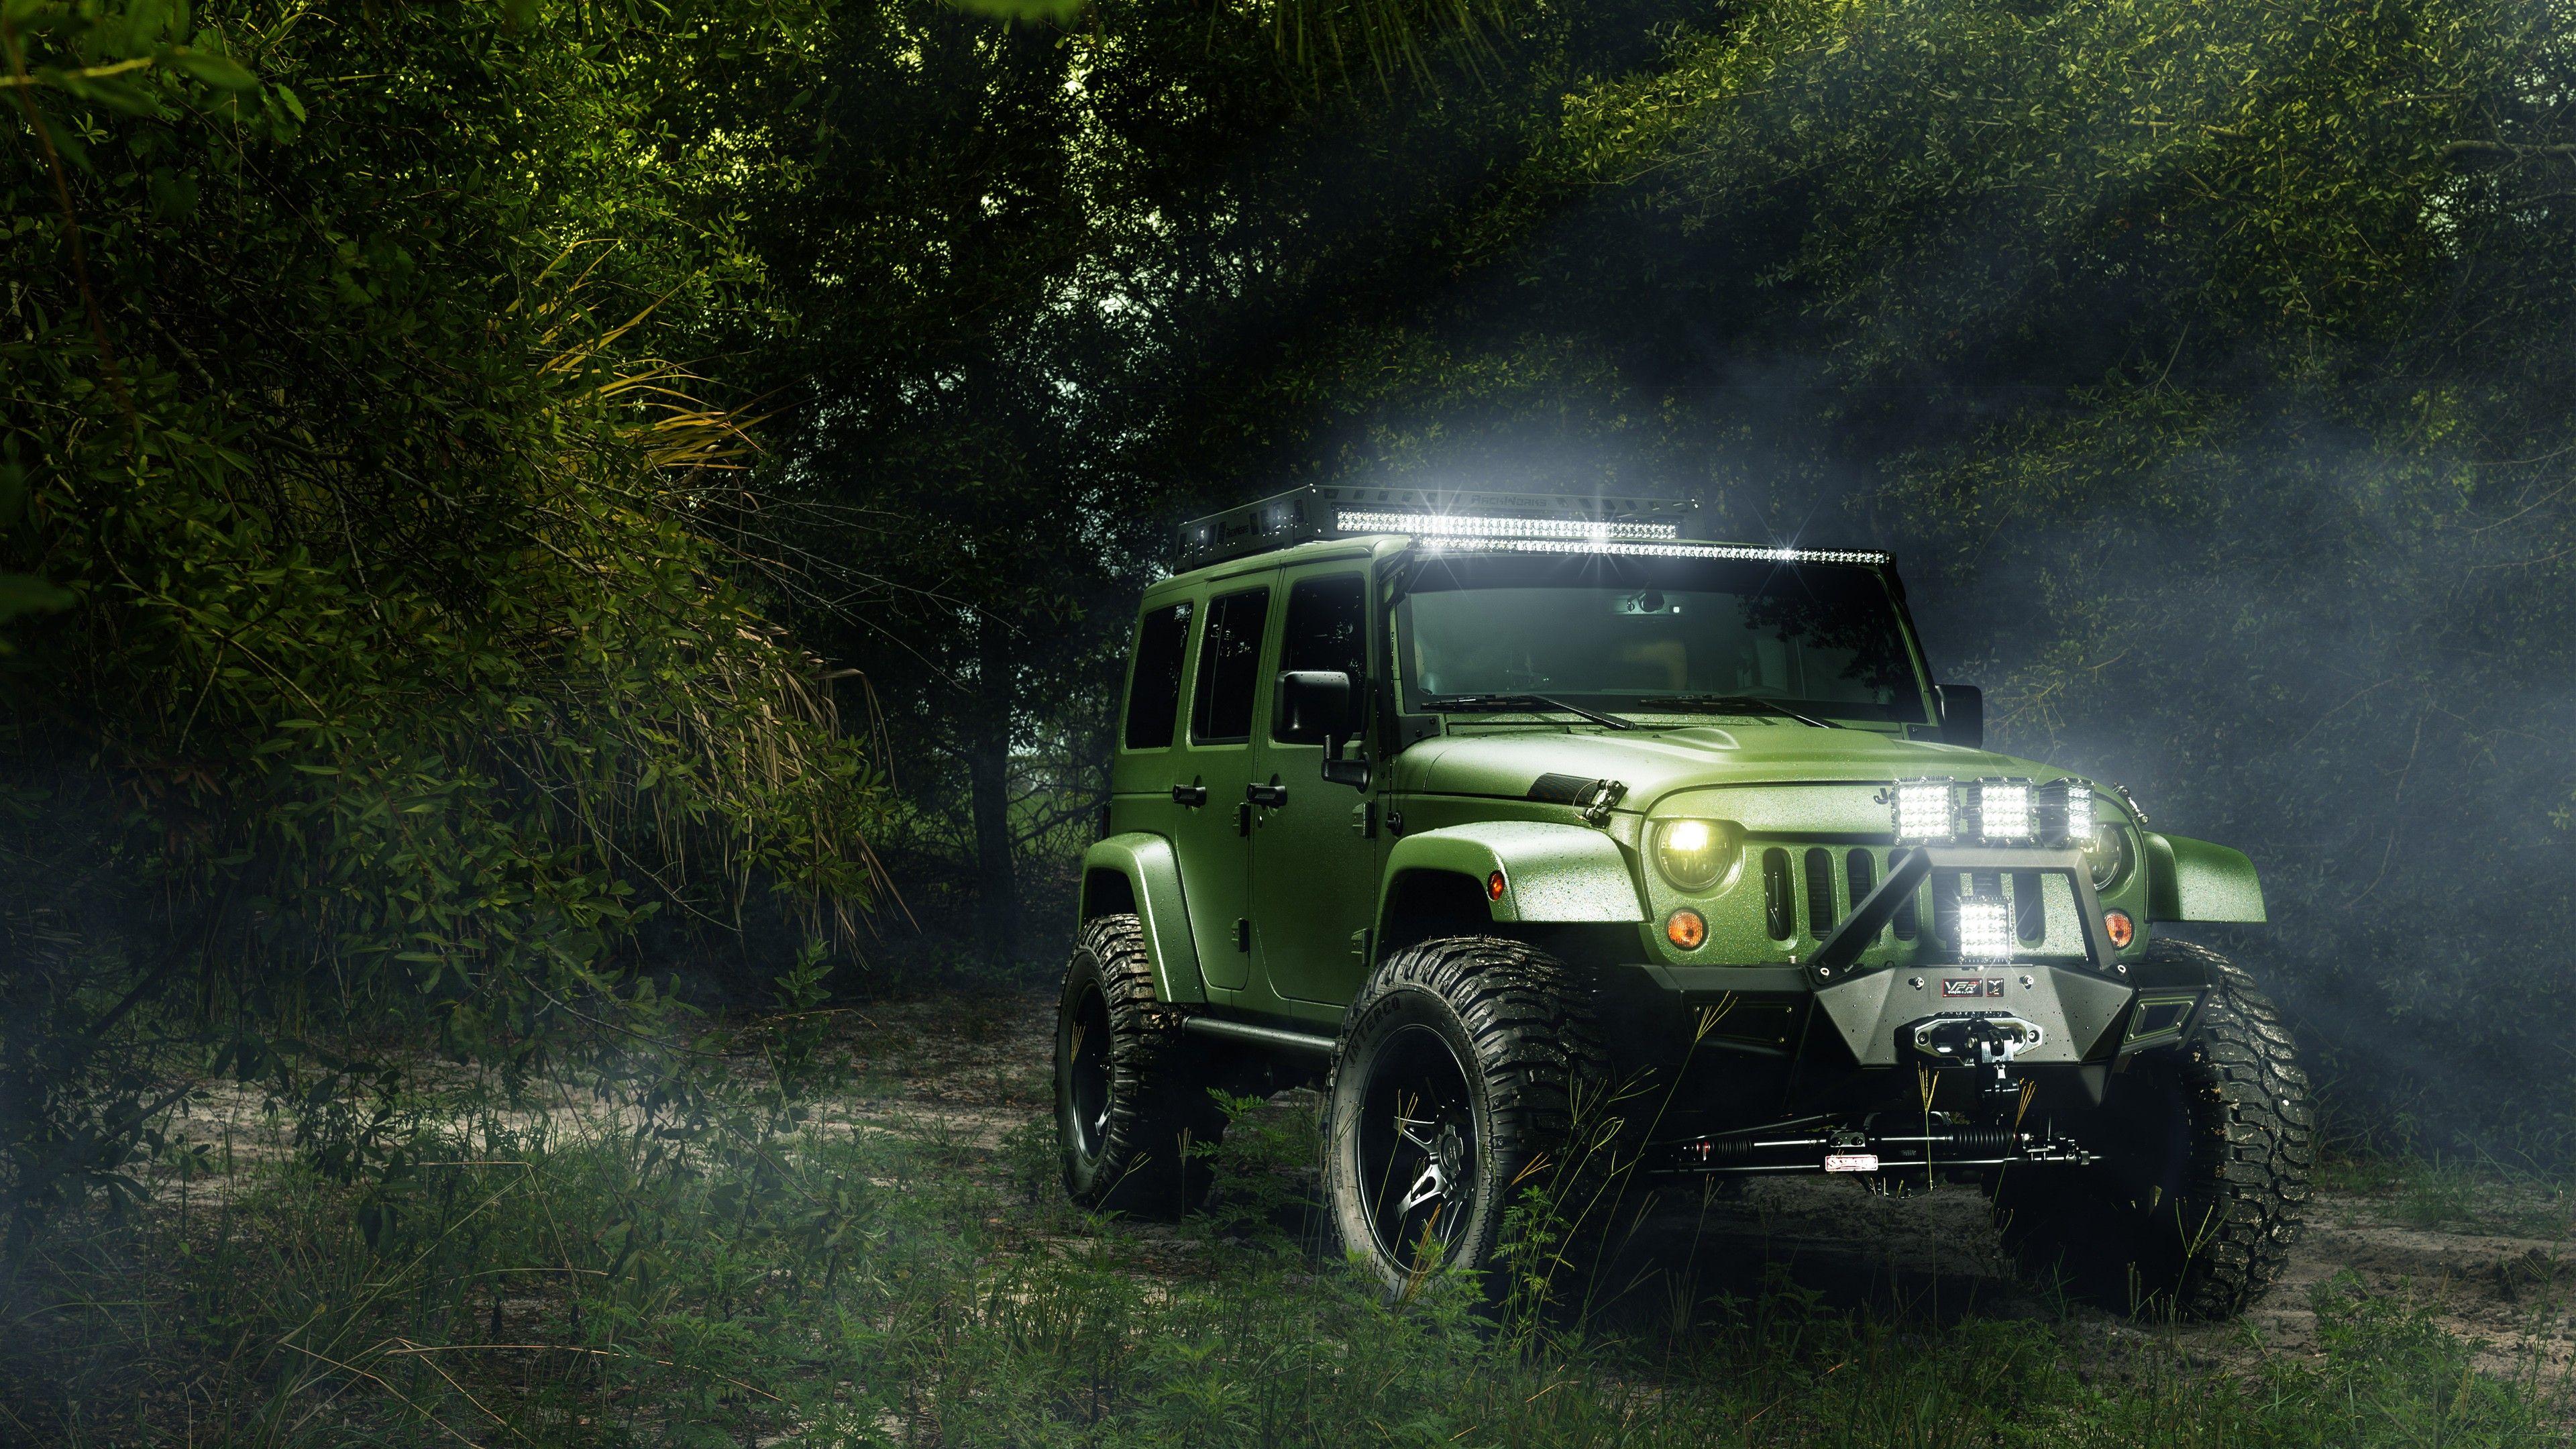 Jeep Led Headlight Jeep Wallpapers Cars Wallpapers Jeep Wallpaper Jeep Wrangler Cool Jeeps